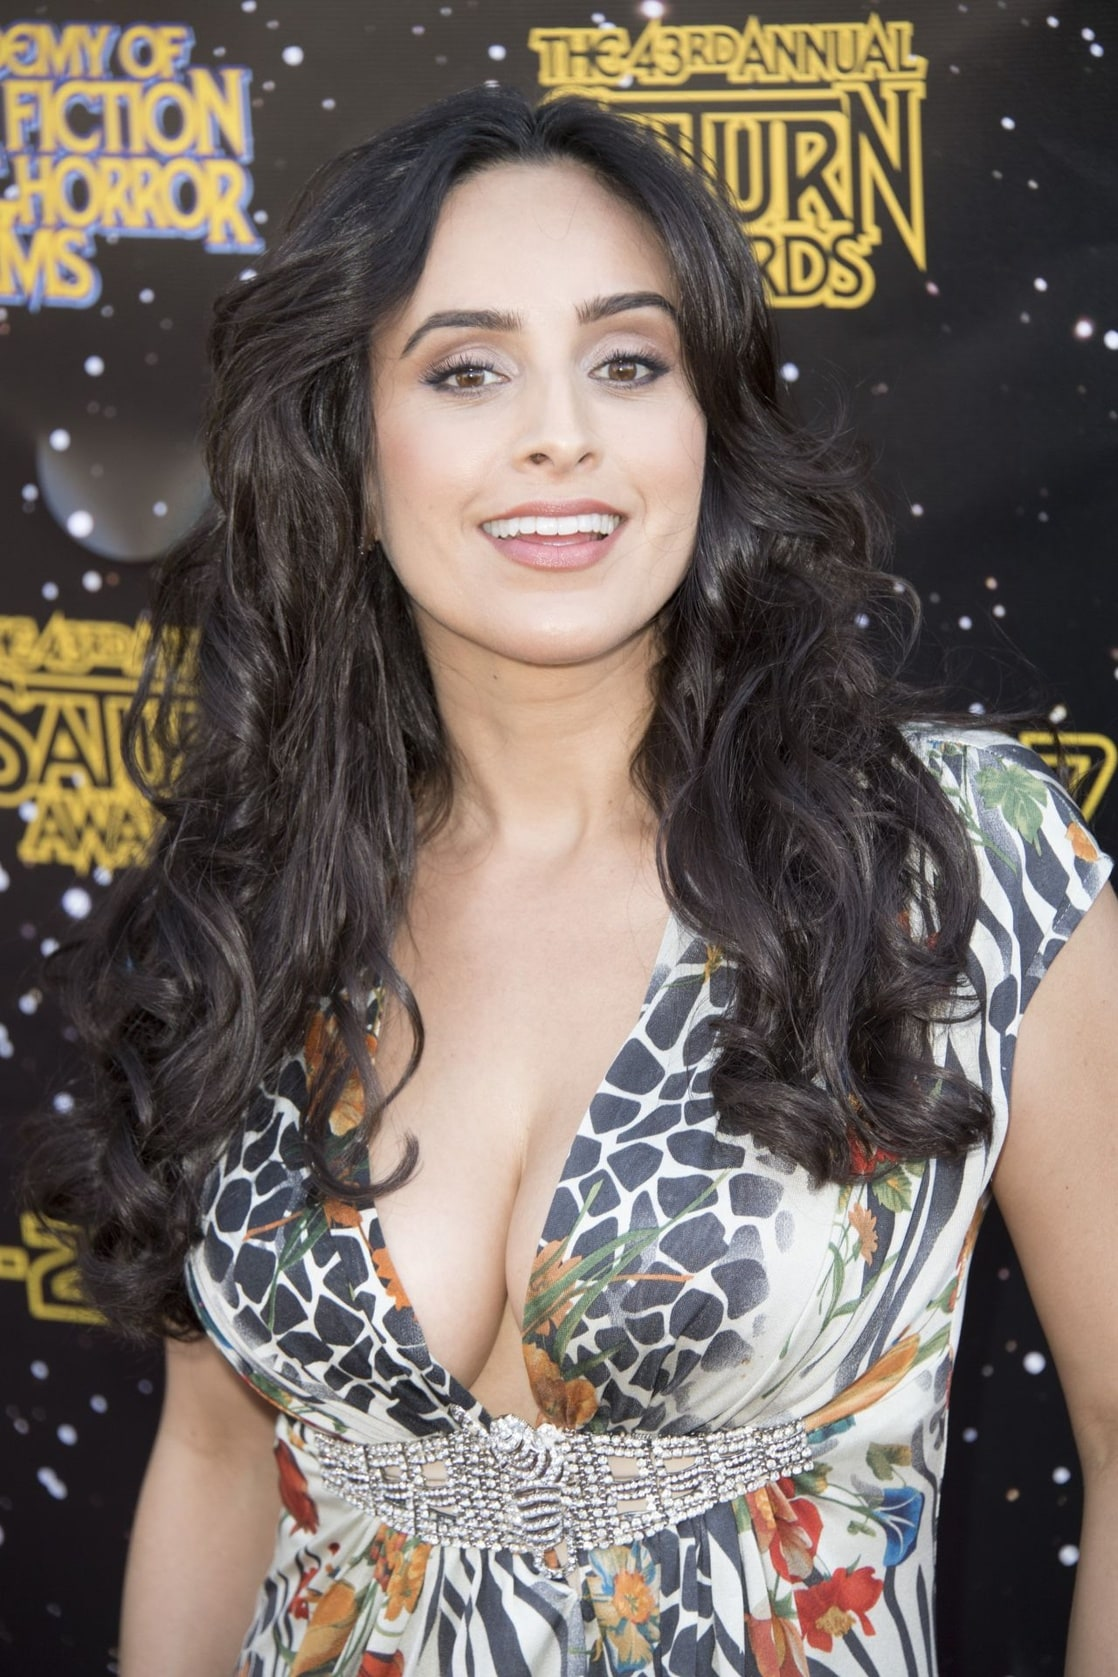 Pics Valerie Perez nude (38 pics), Tits